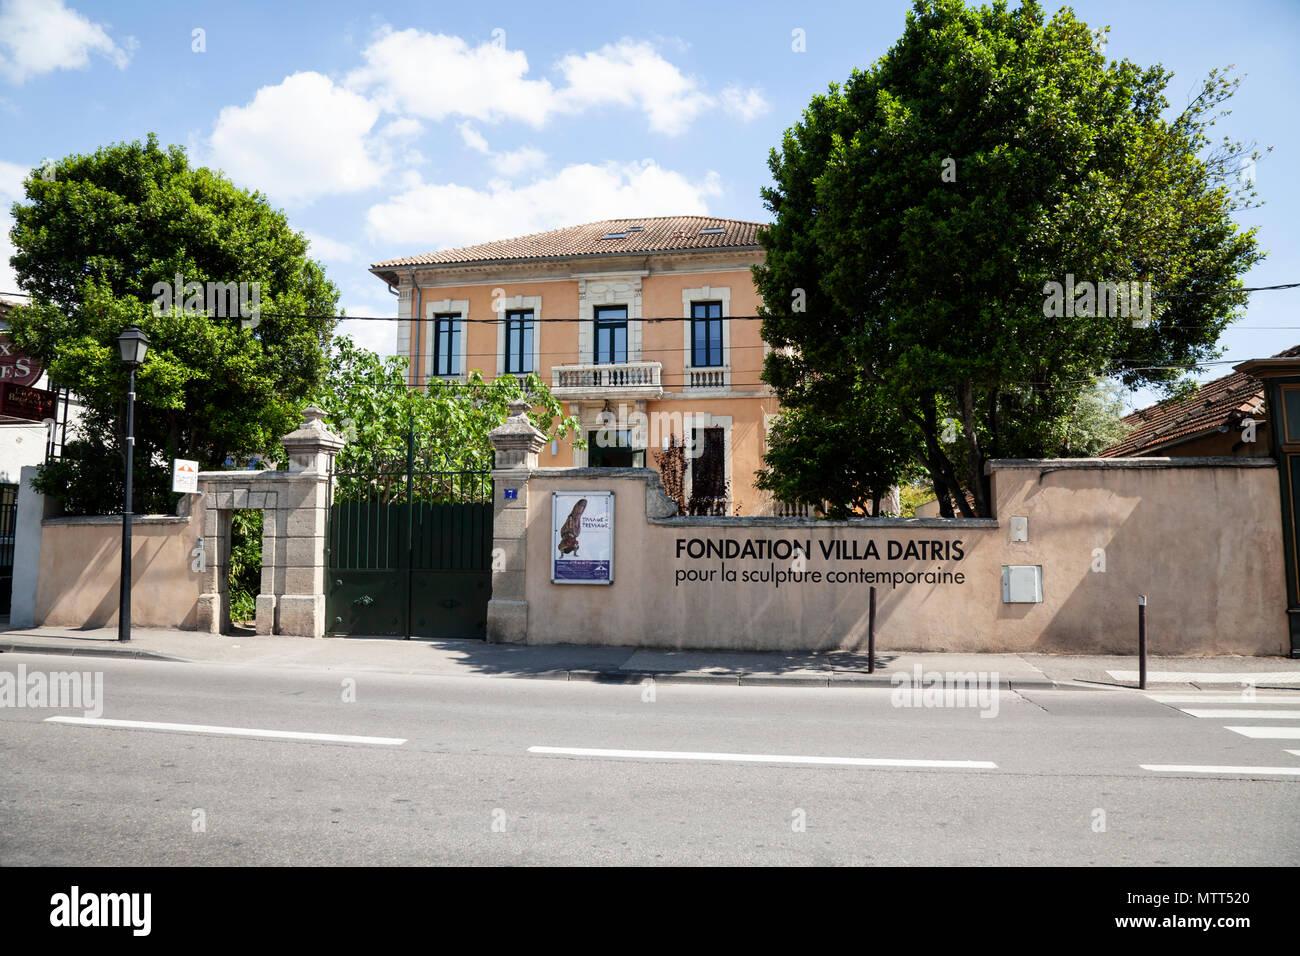 Fondation Villa Datris exhibiting contemporary sculpture in L'Isle-sur-la-Sorgue, Provence - Stock Image